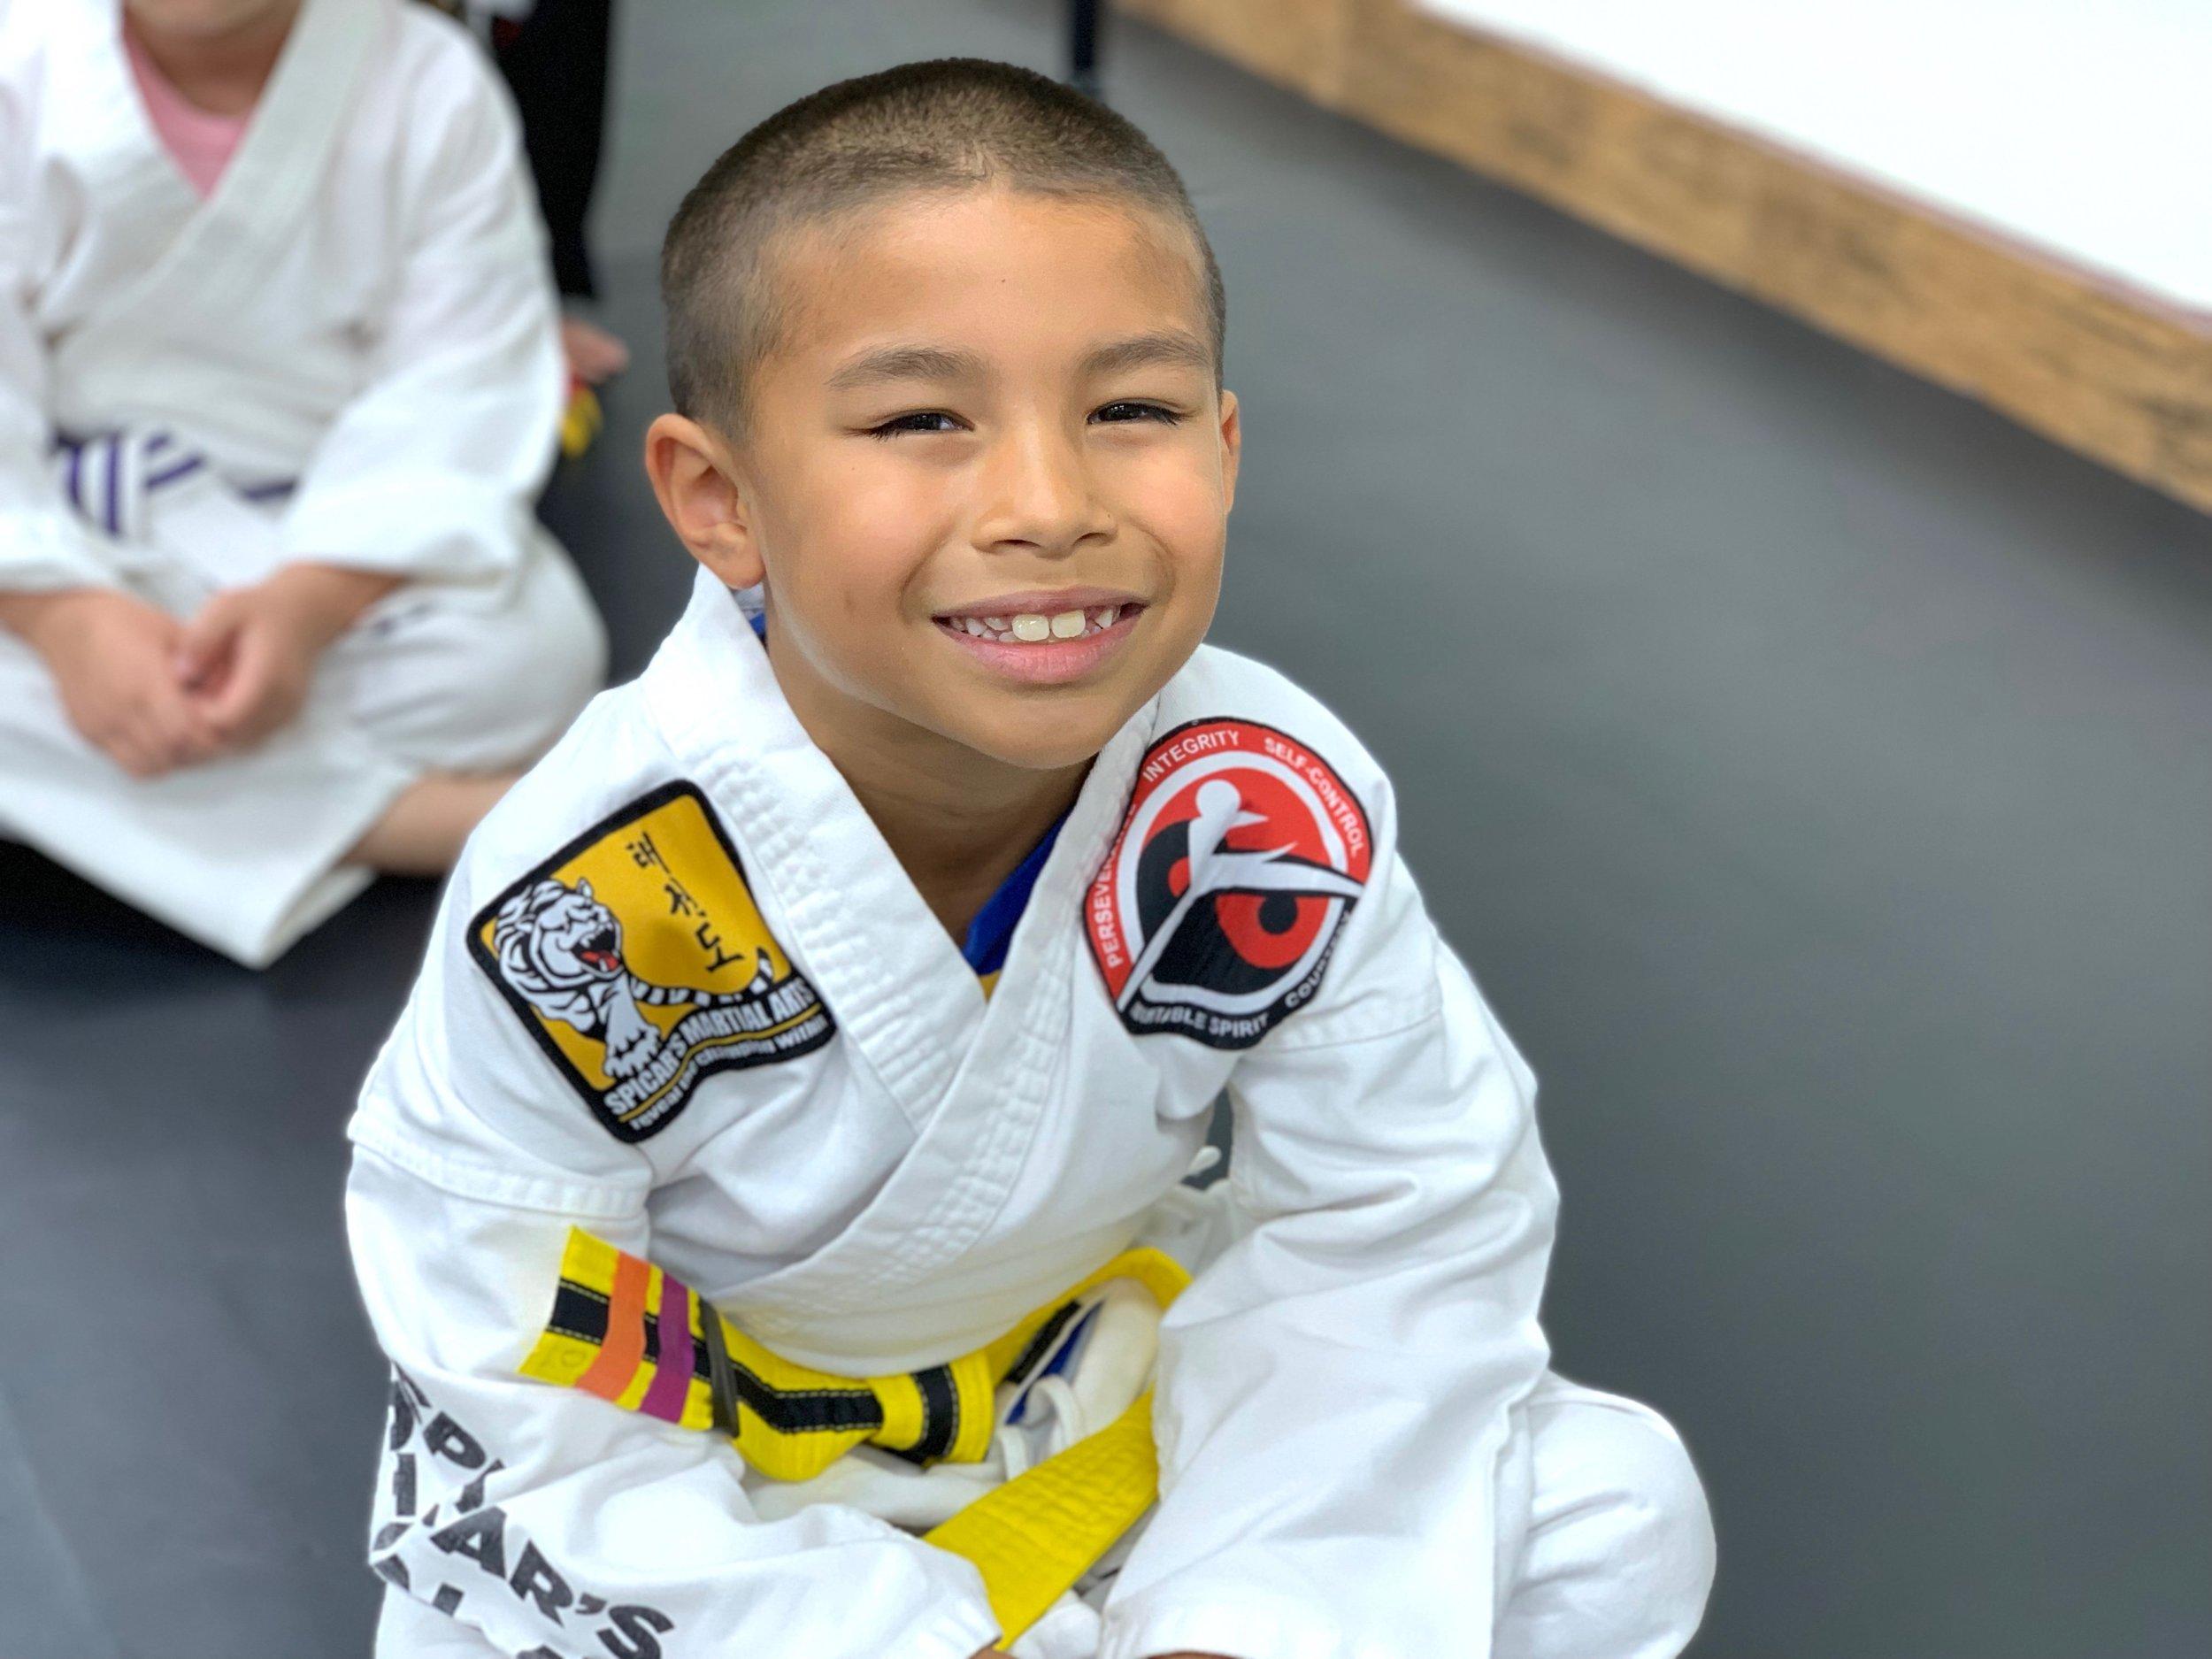 karate-kids-program-souhtlake-keller-grapevine-texas00052.jpeg